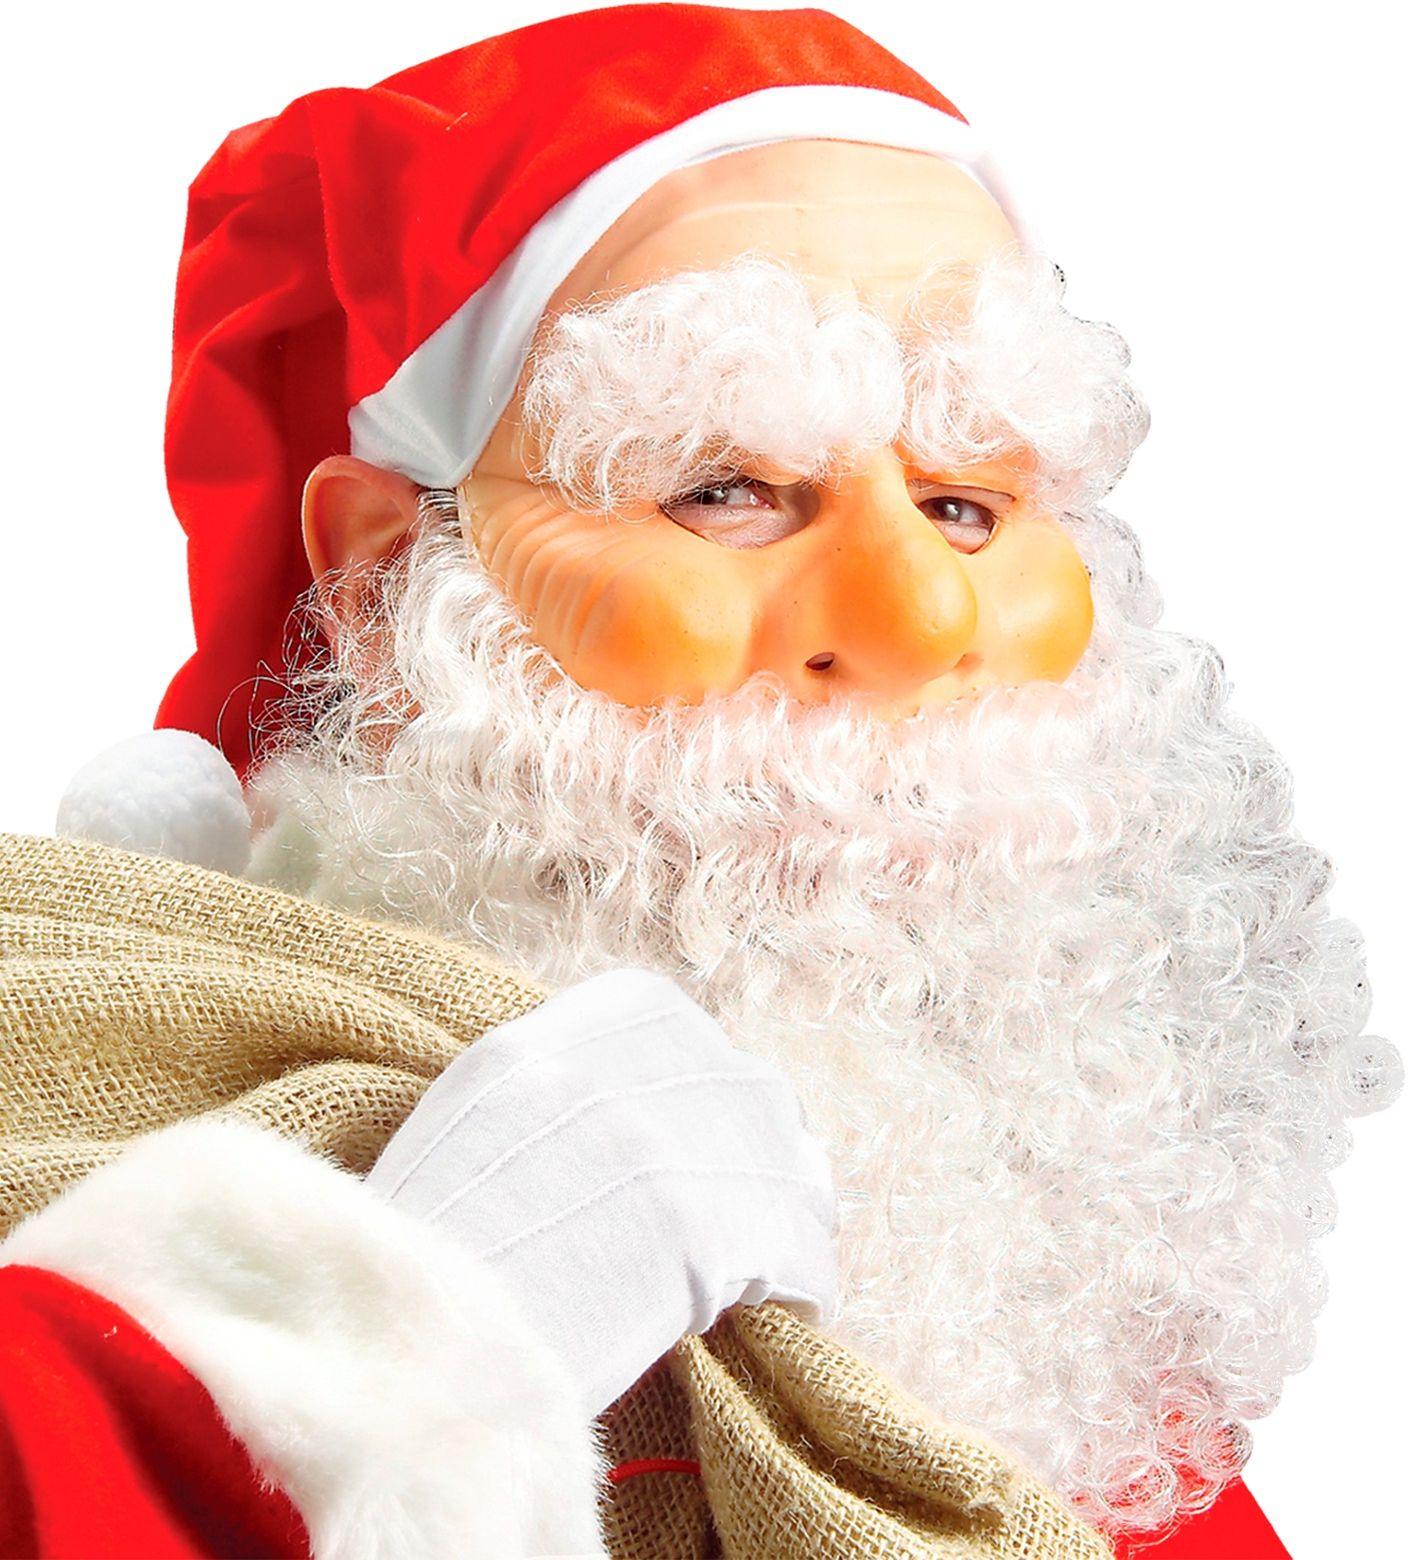 Kerstman masker met muts, baard, snor en wenkbrauwen